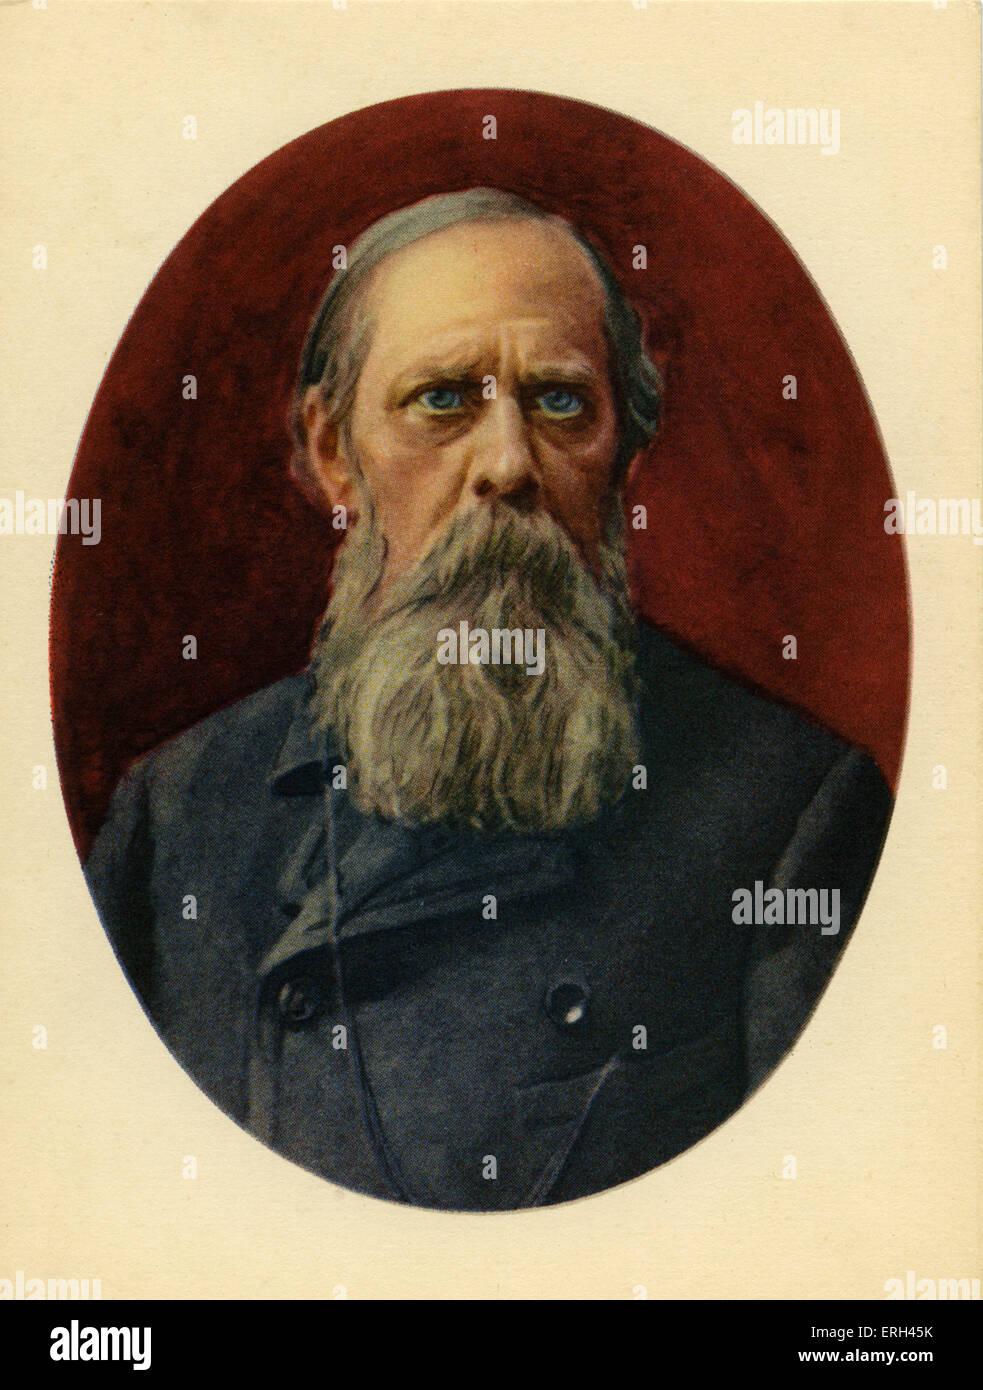 Schredin (Mikhail Saltykov-Schredin), Russian writer and satirist, 27 January 1826 - 10 May 1889. - Stock Image